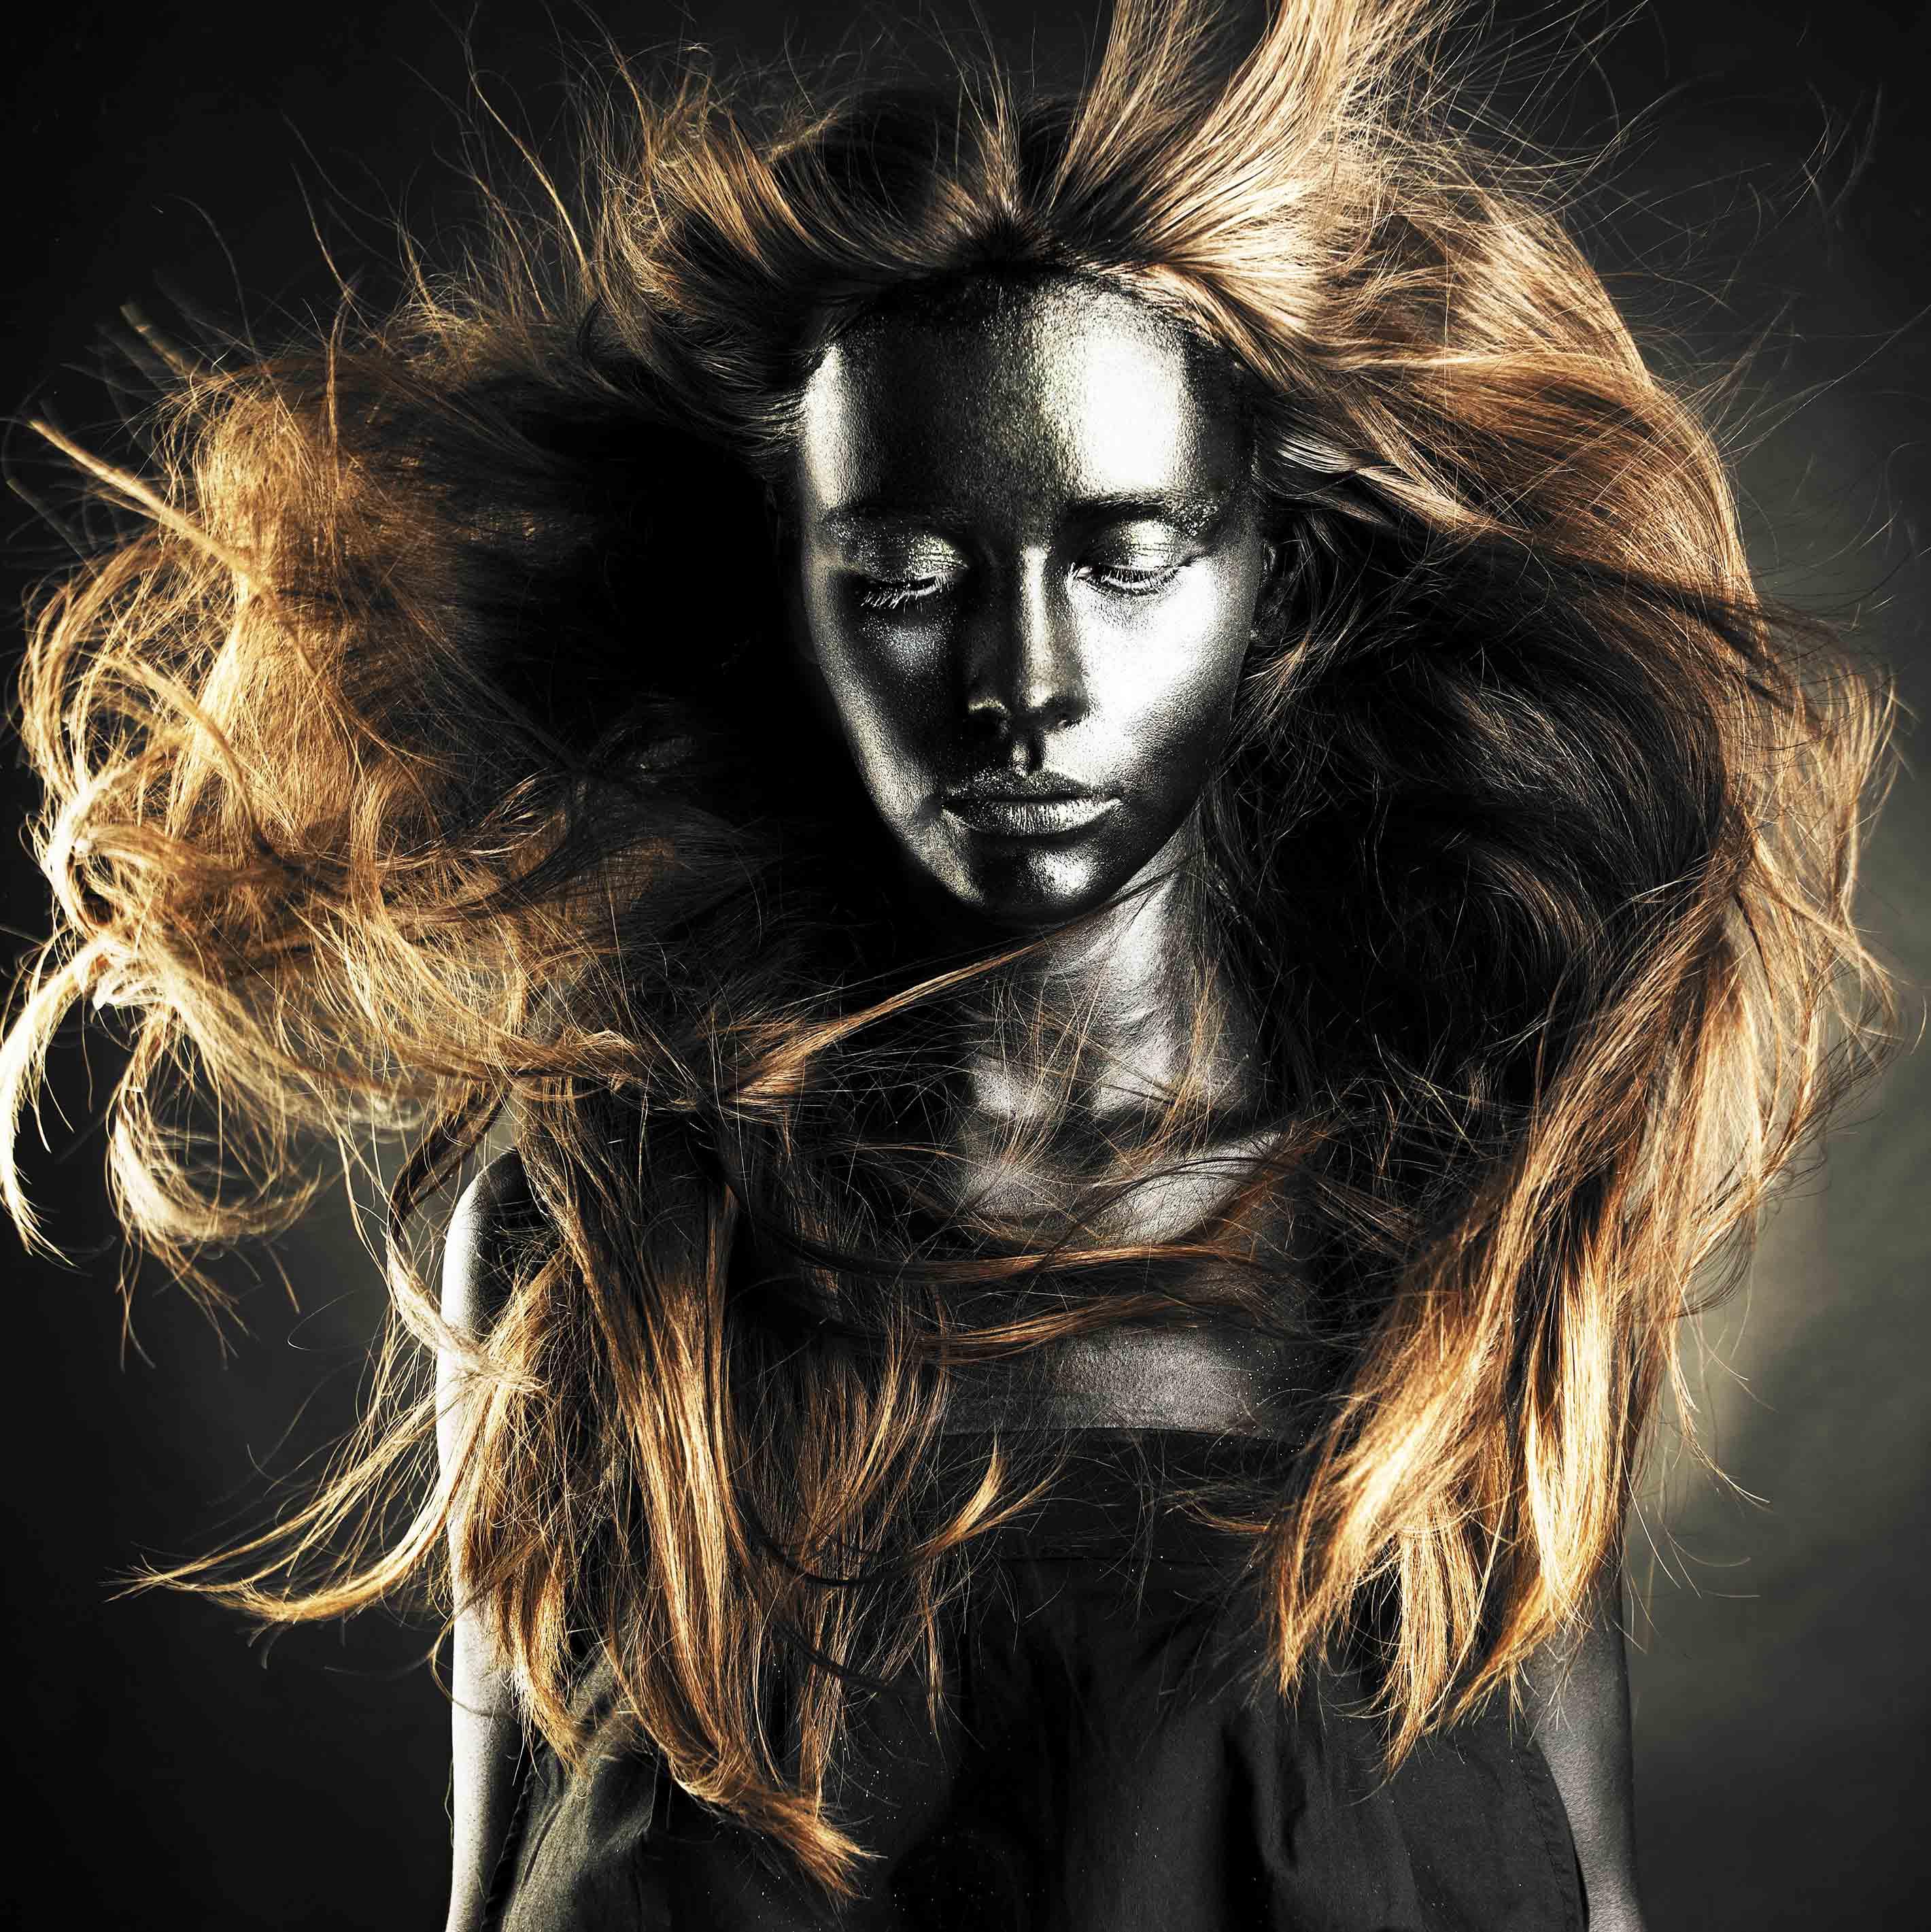 Blacktex_Girl_Image